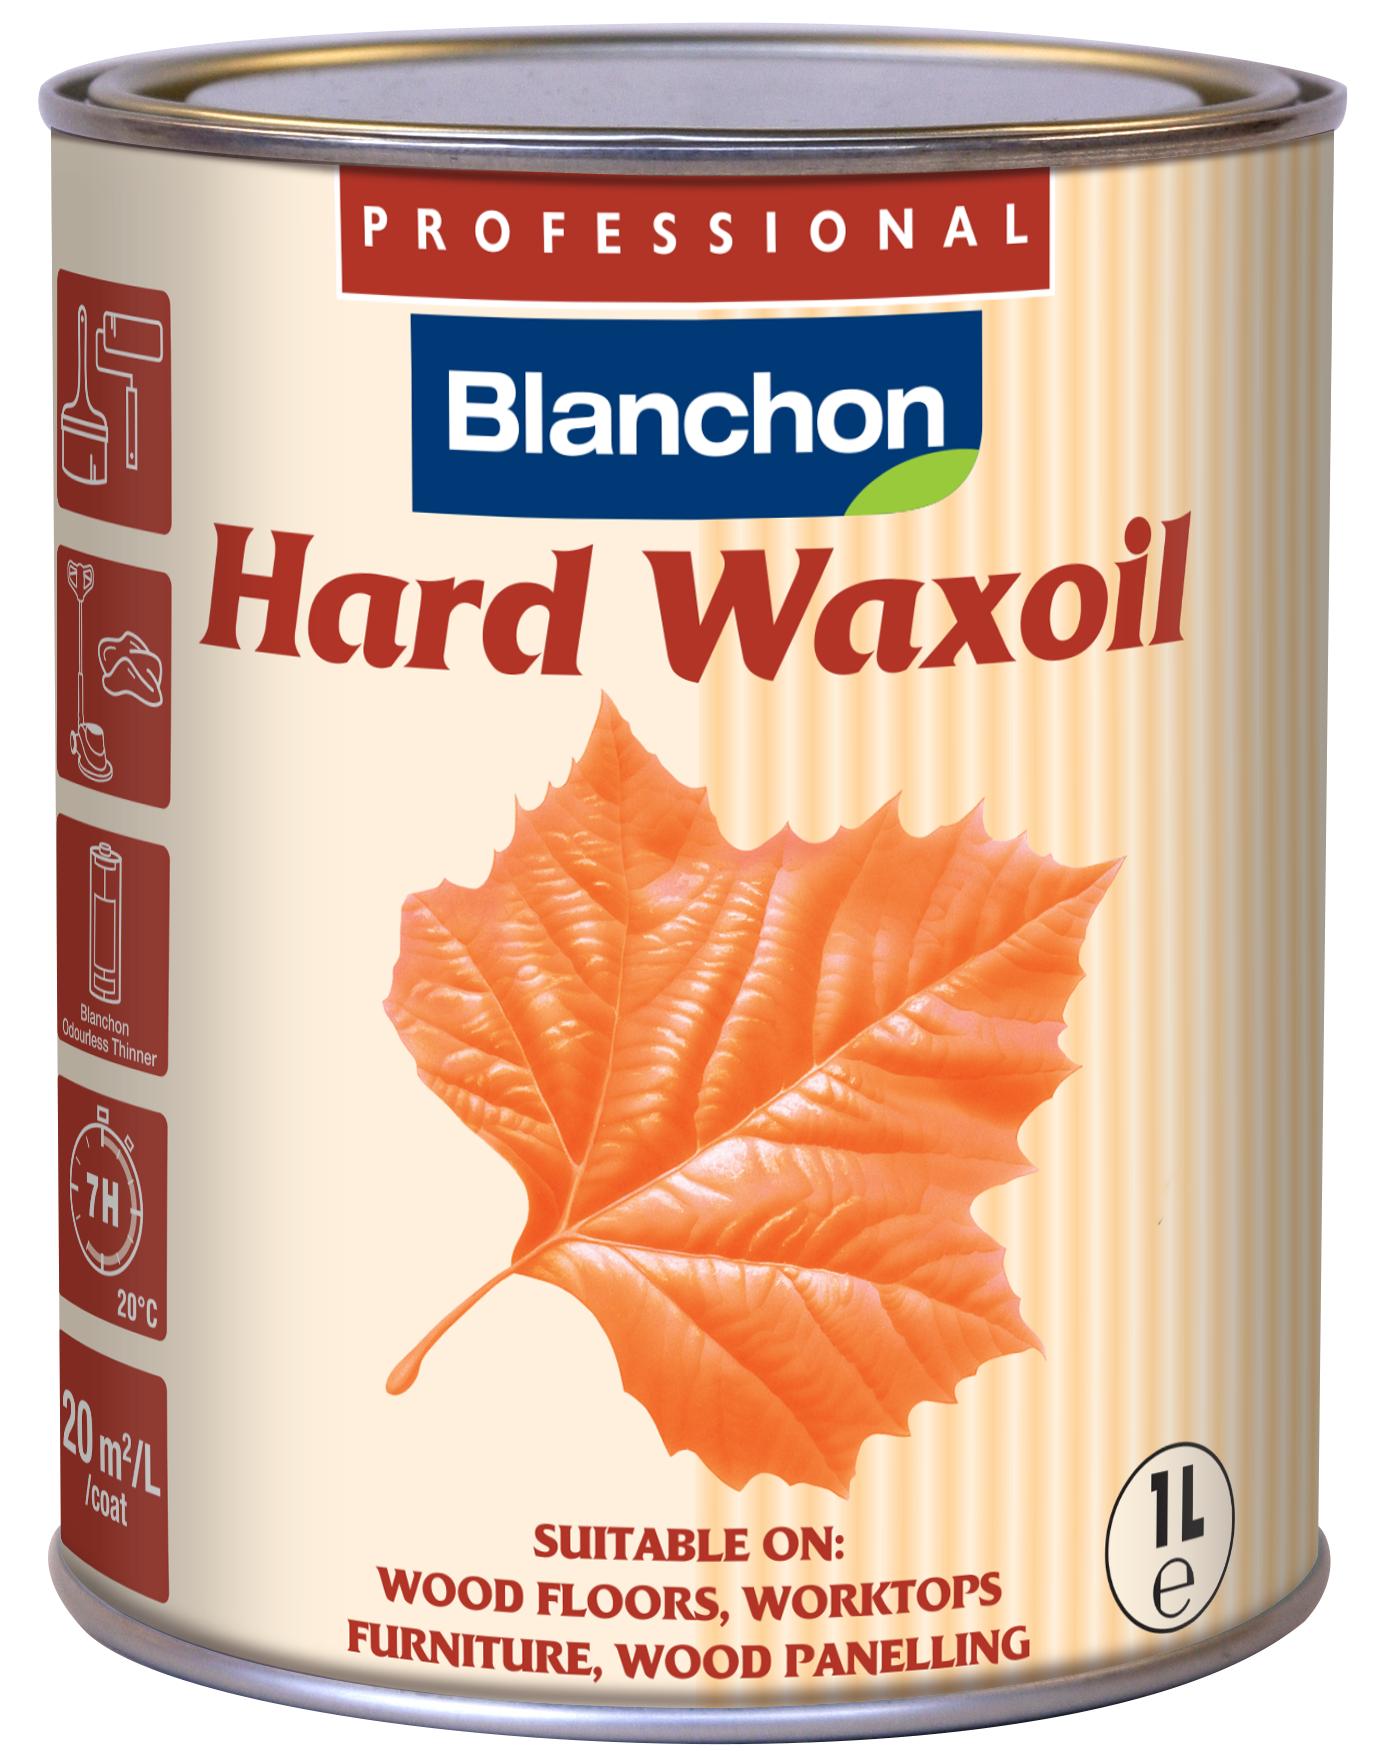 Hard Waxoil